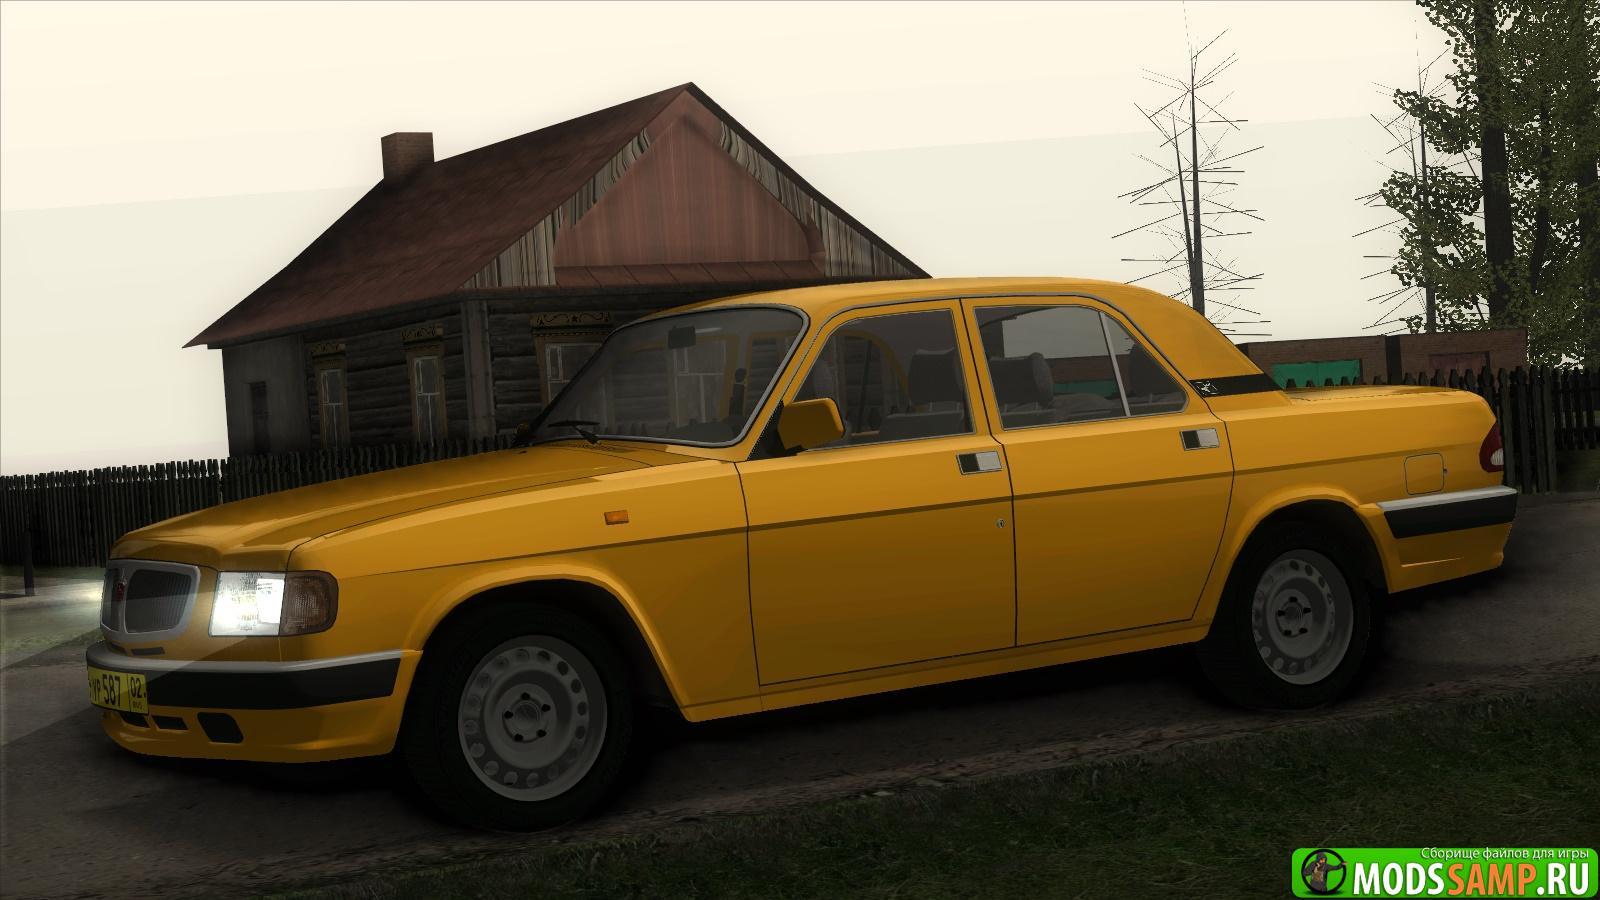 ГАЗ 3110 Волга Такси для GTA:SA